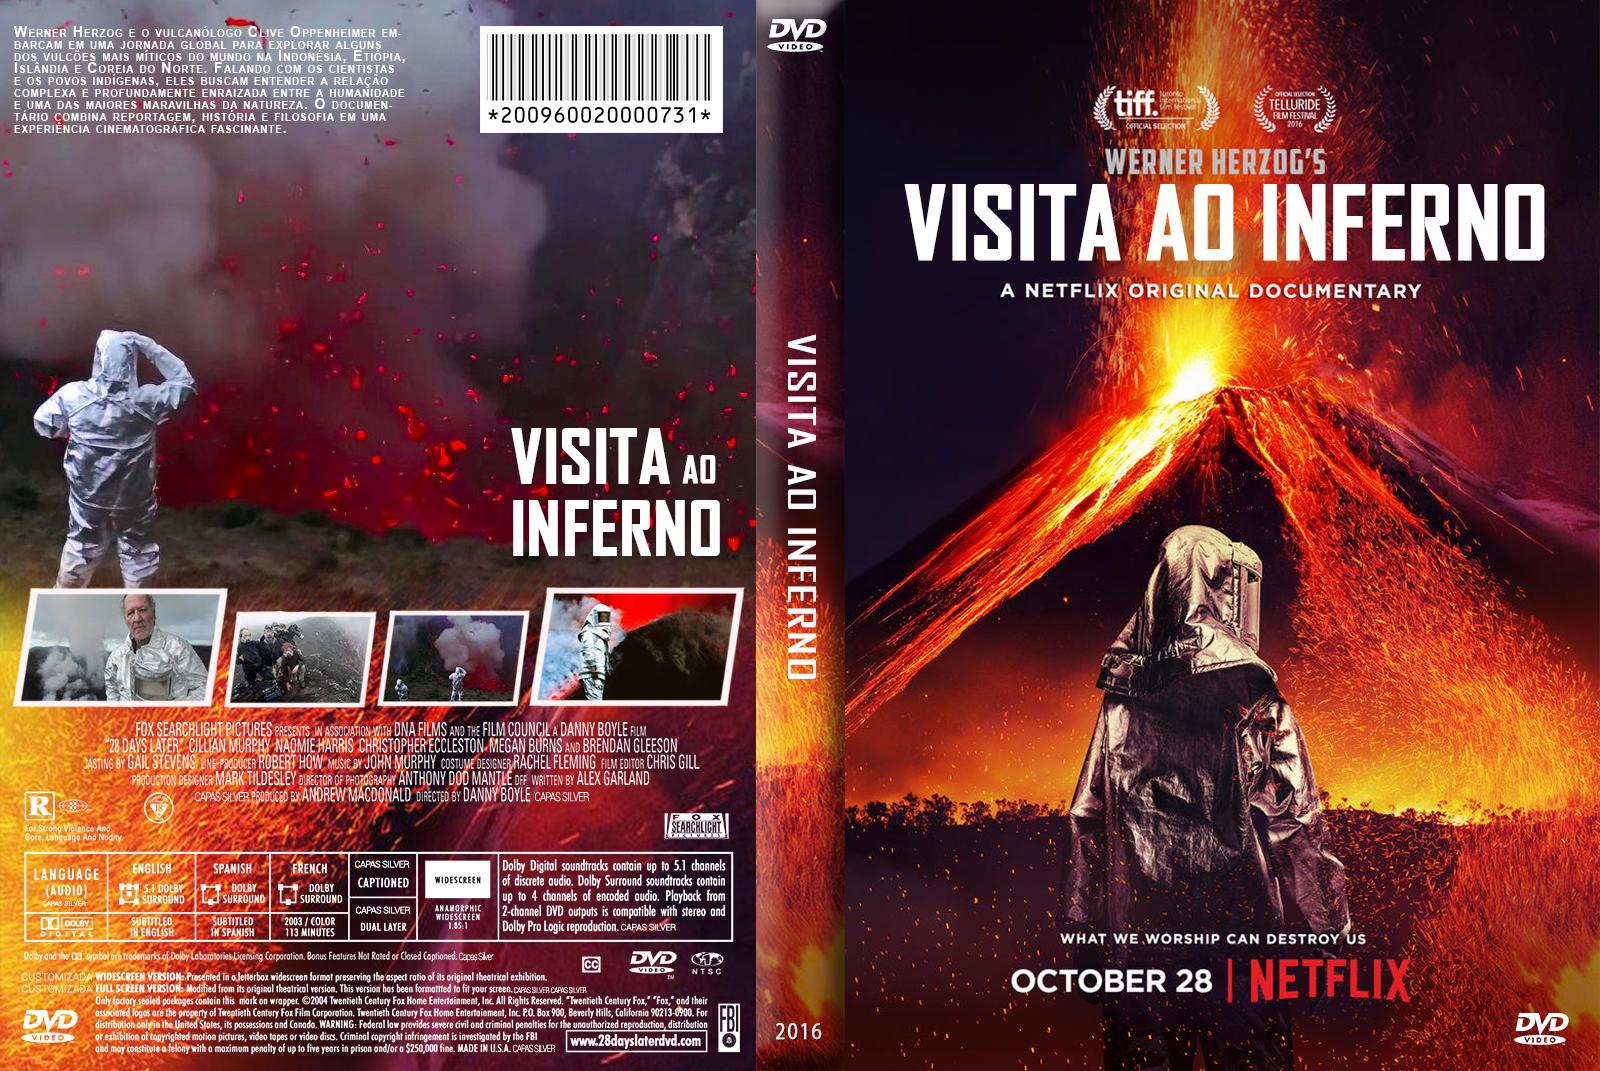 Download Visita ao Inferno DVD-R Visita 2Bao 2BInferno 2B  2BCAPA